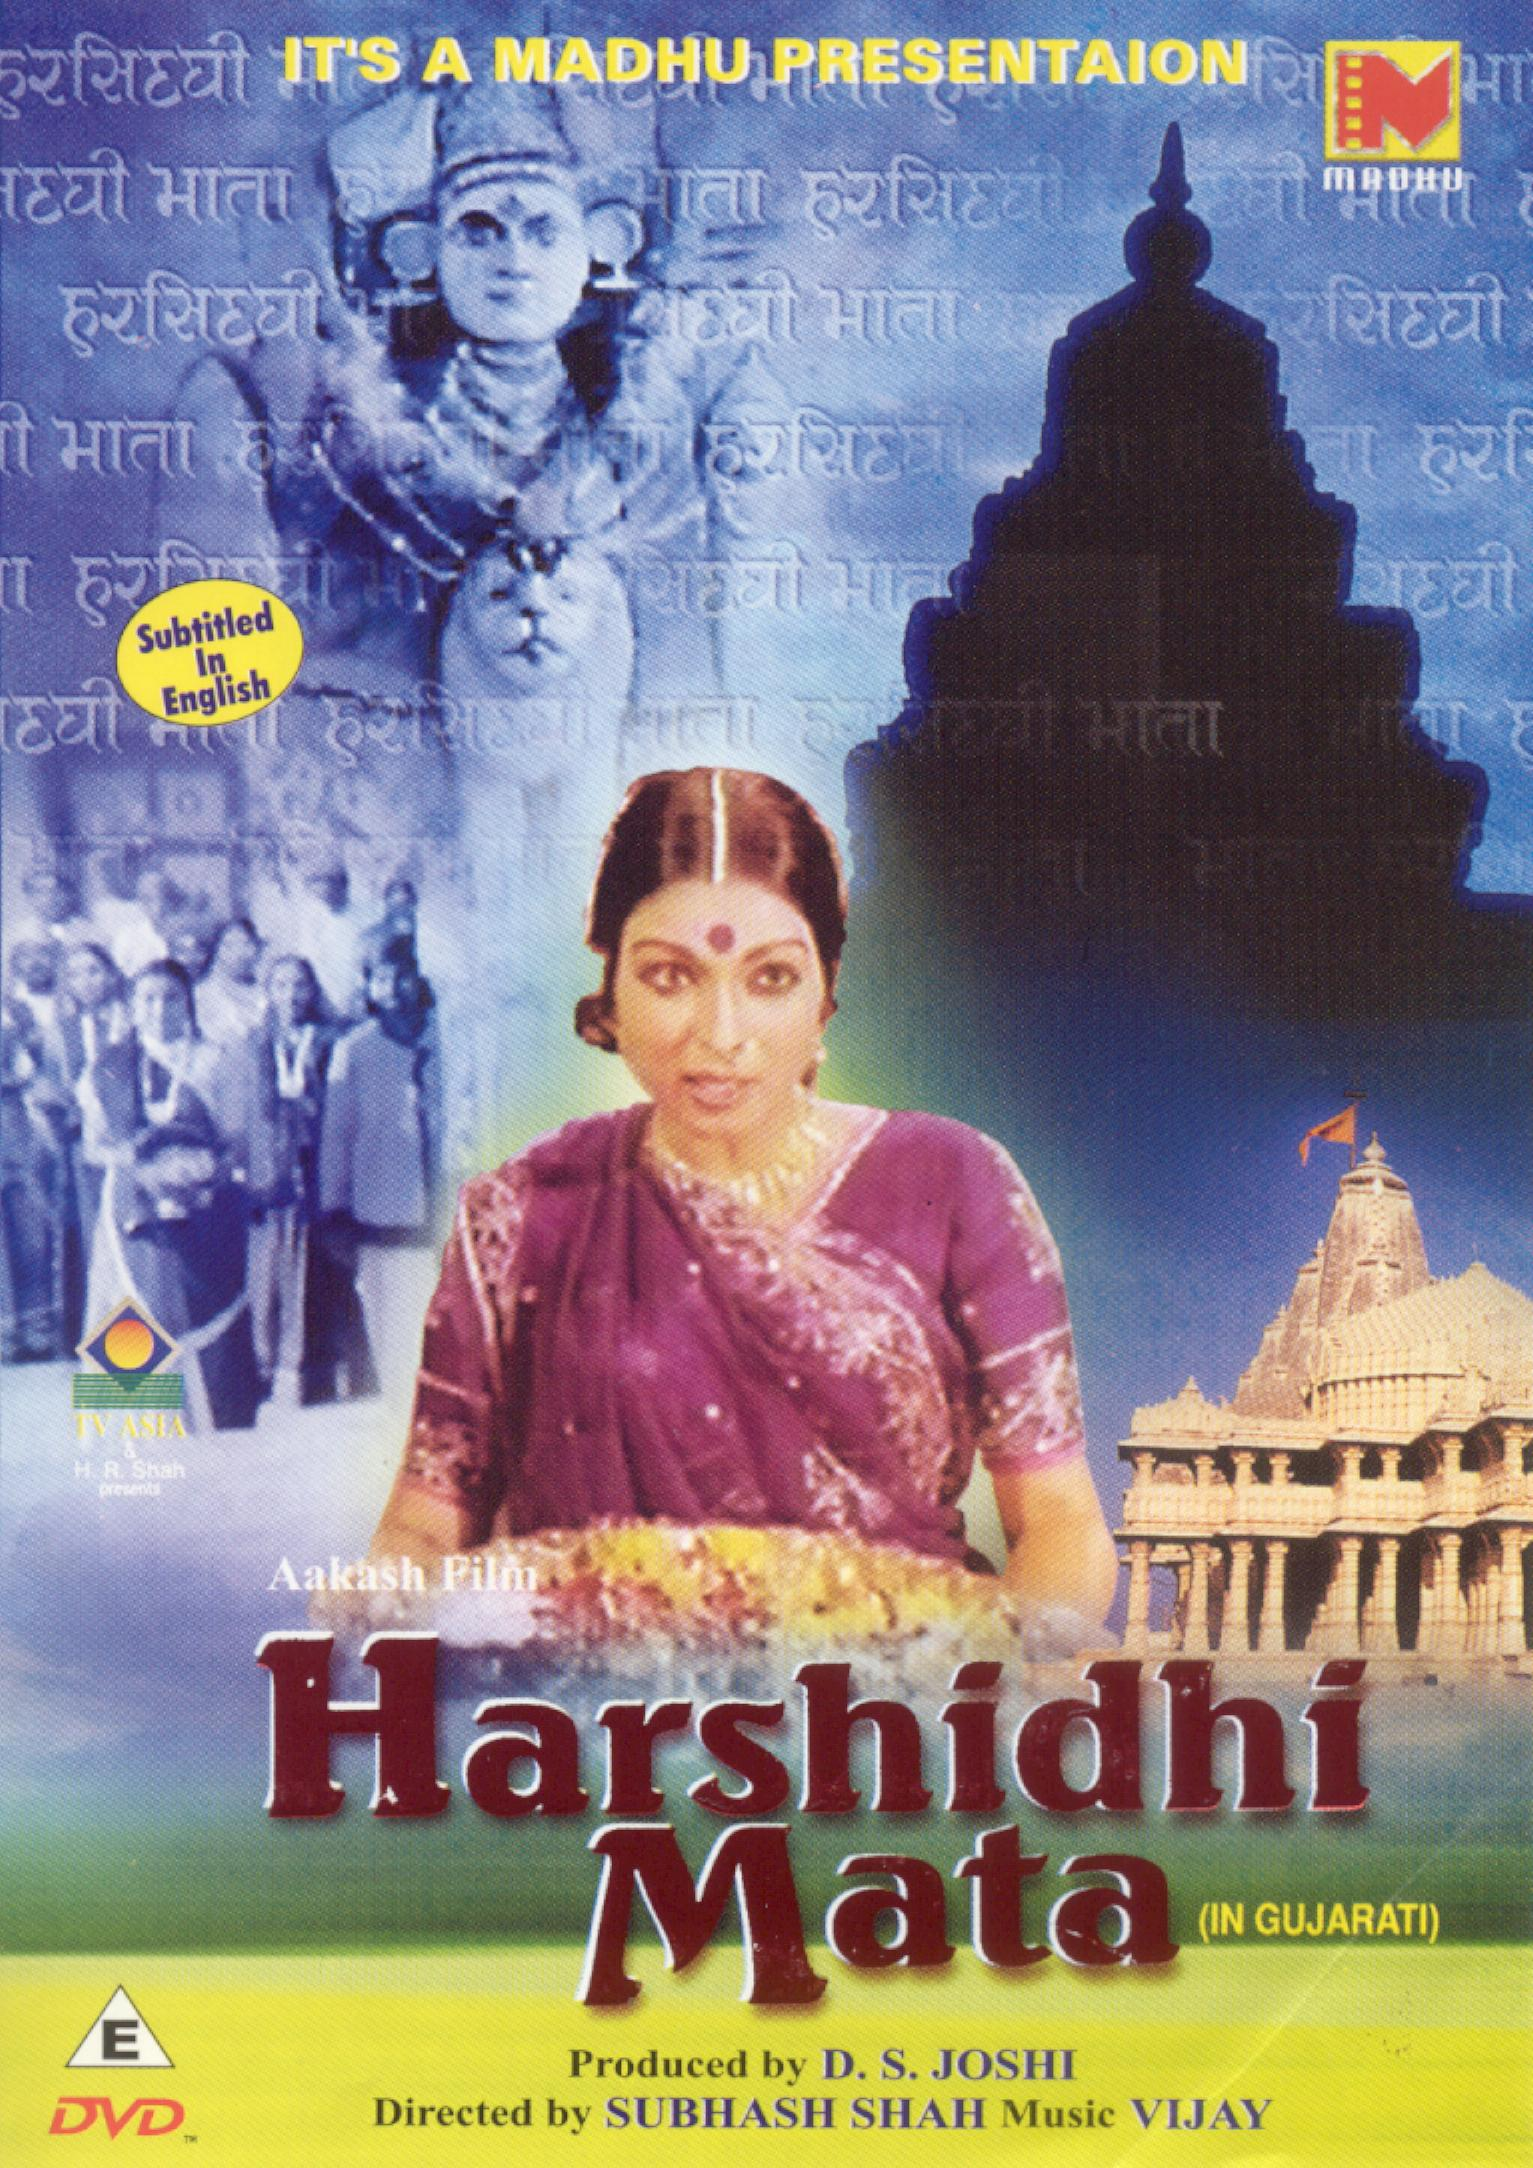 Harshidhi Mata